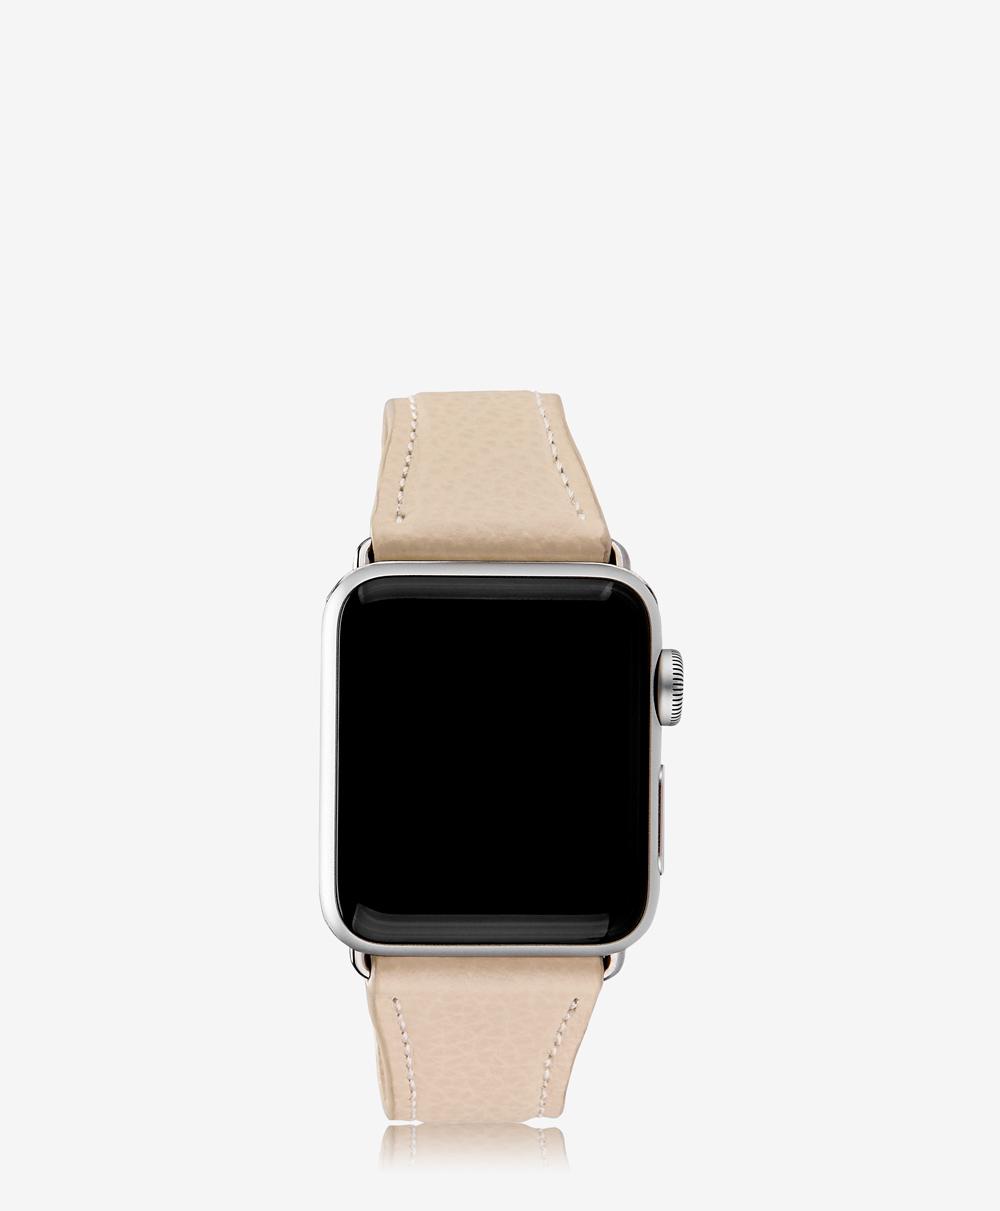 38mm Apple Watch Band Almond Pebble Grain AWS-38MS-FLO-ALM